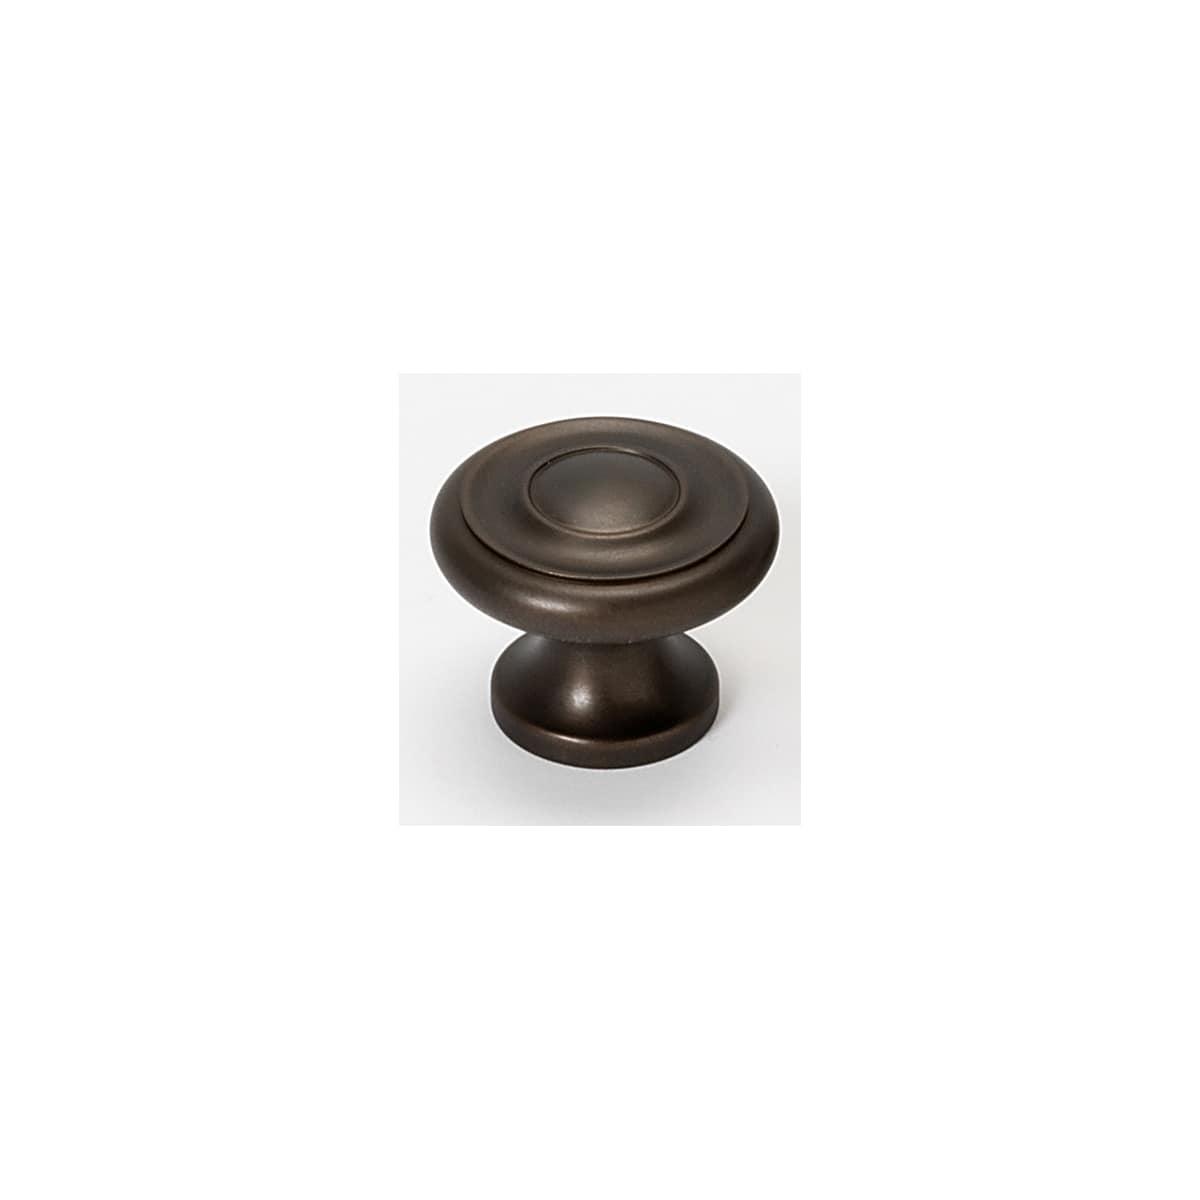 Alno Knobs 1 Inch Mushroom Cabinet Knob